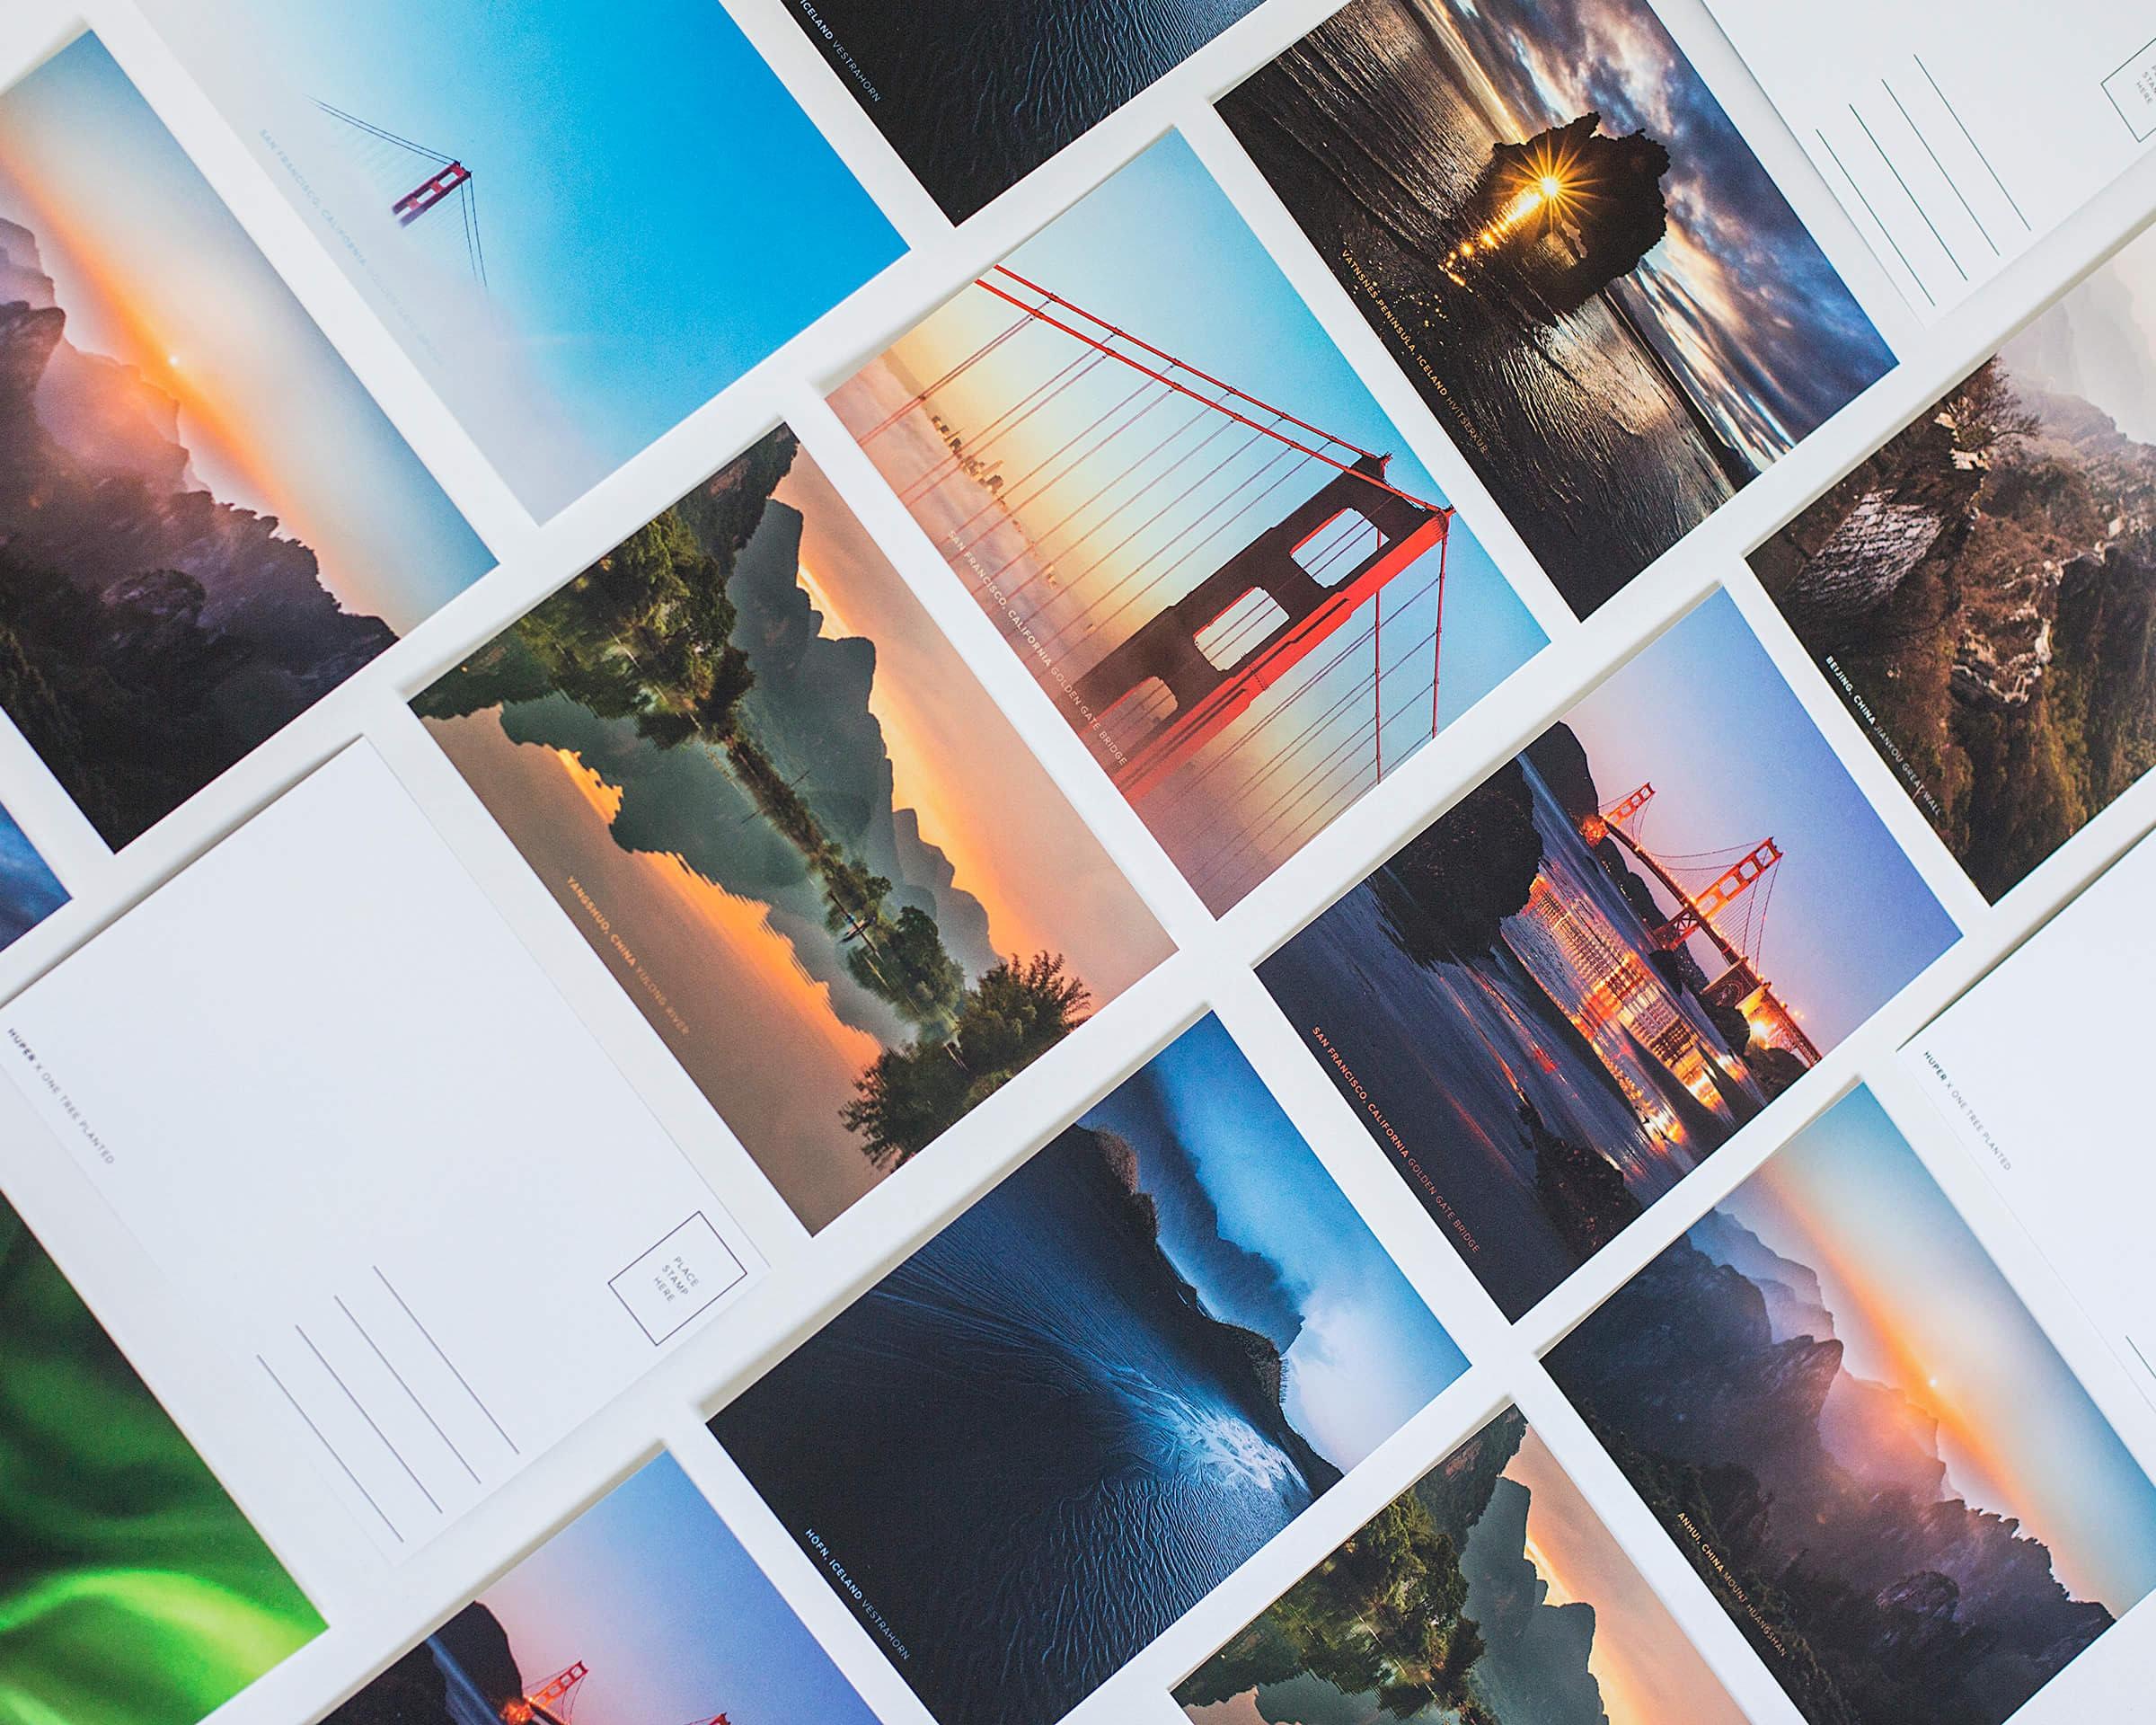 Huper+Postcard+Pack+01.jpg